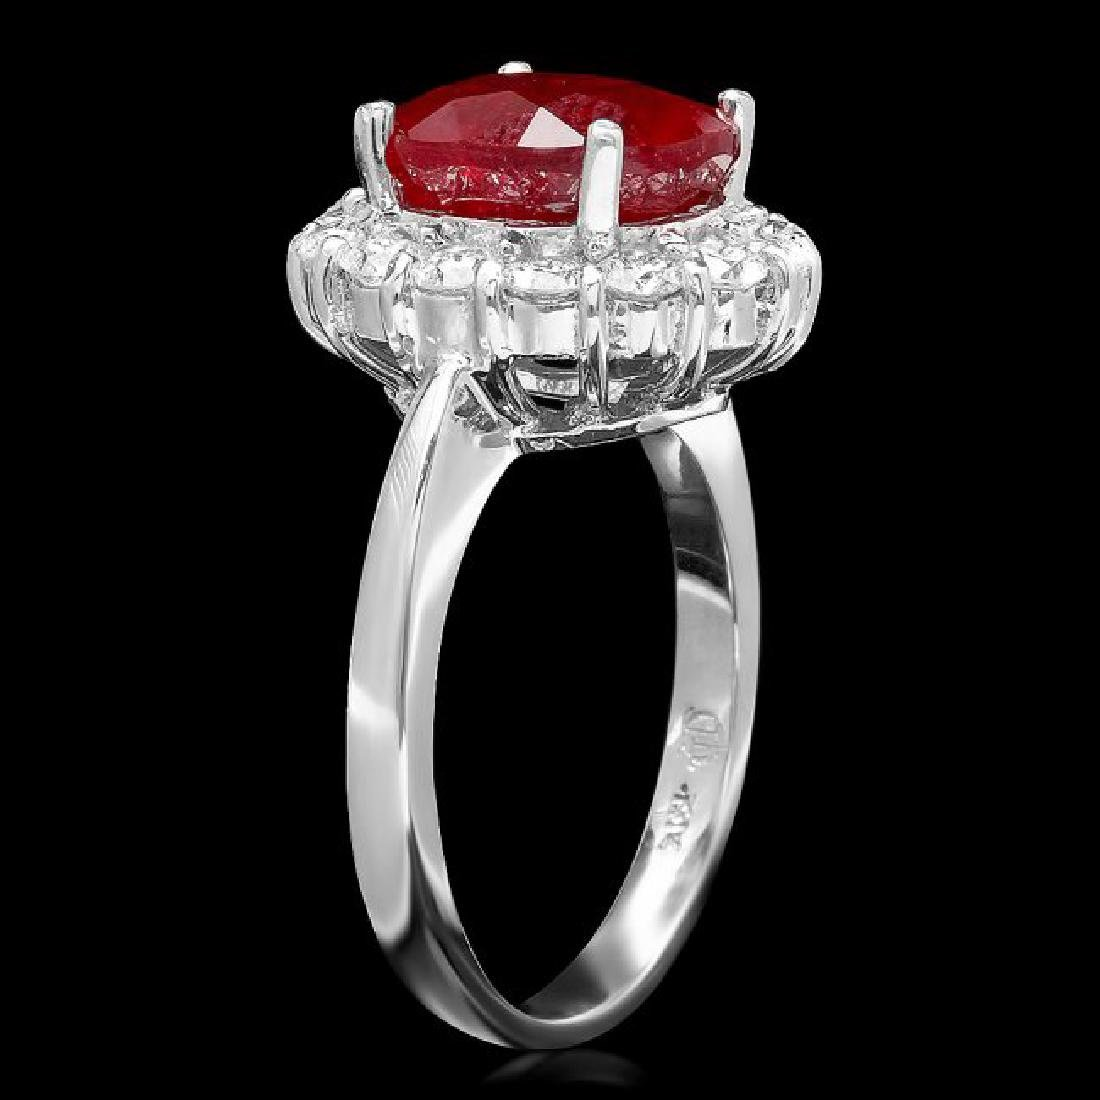 14k White Gold 5.00ct Ruby 0.90ct Diamond Ring - 2